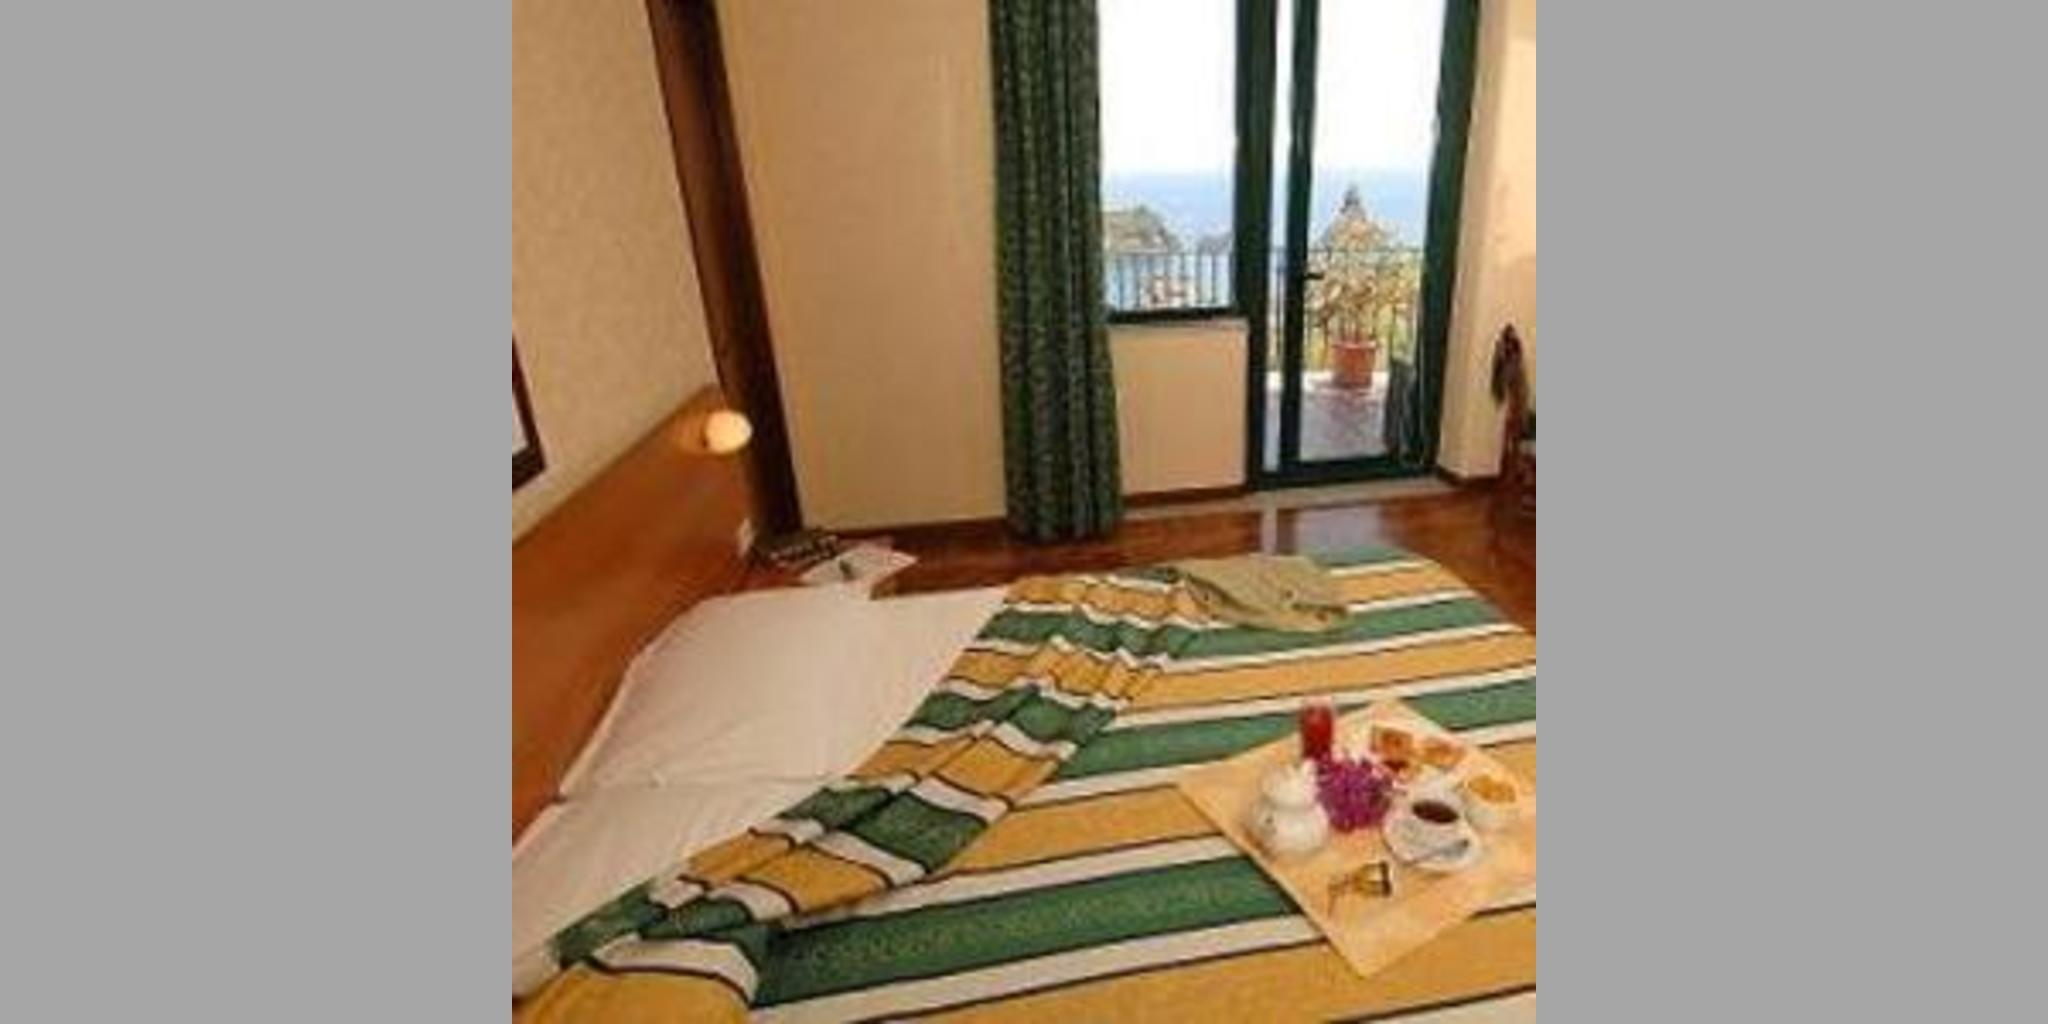 Hotel Aci Castello - Aci Castello